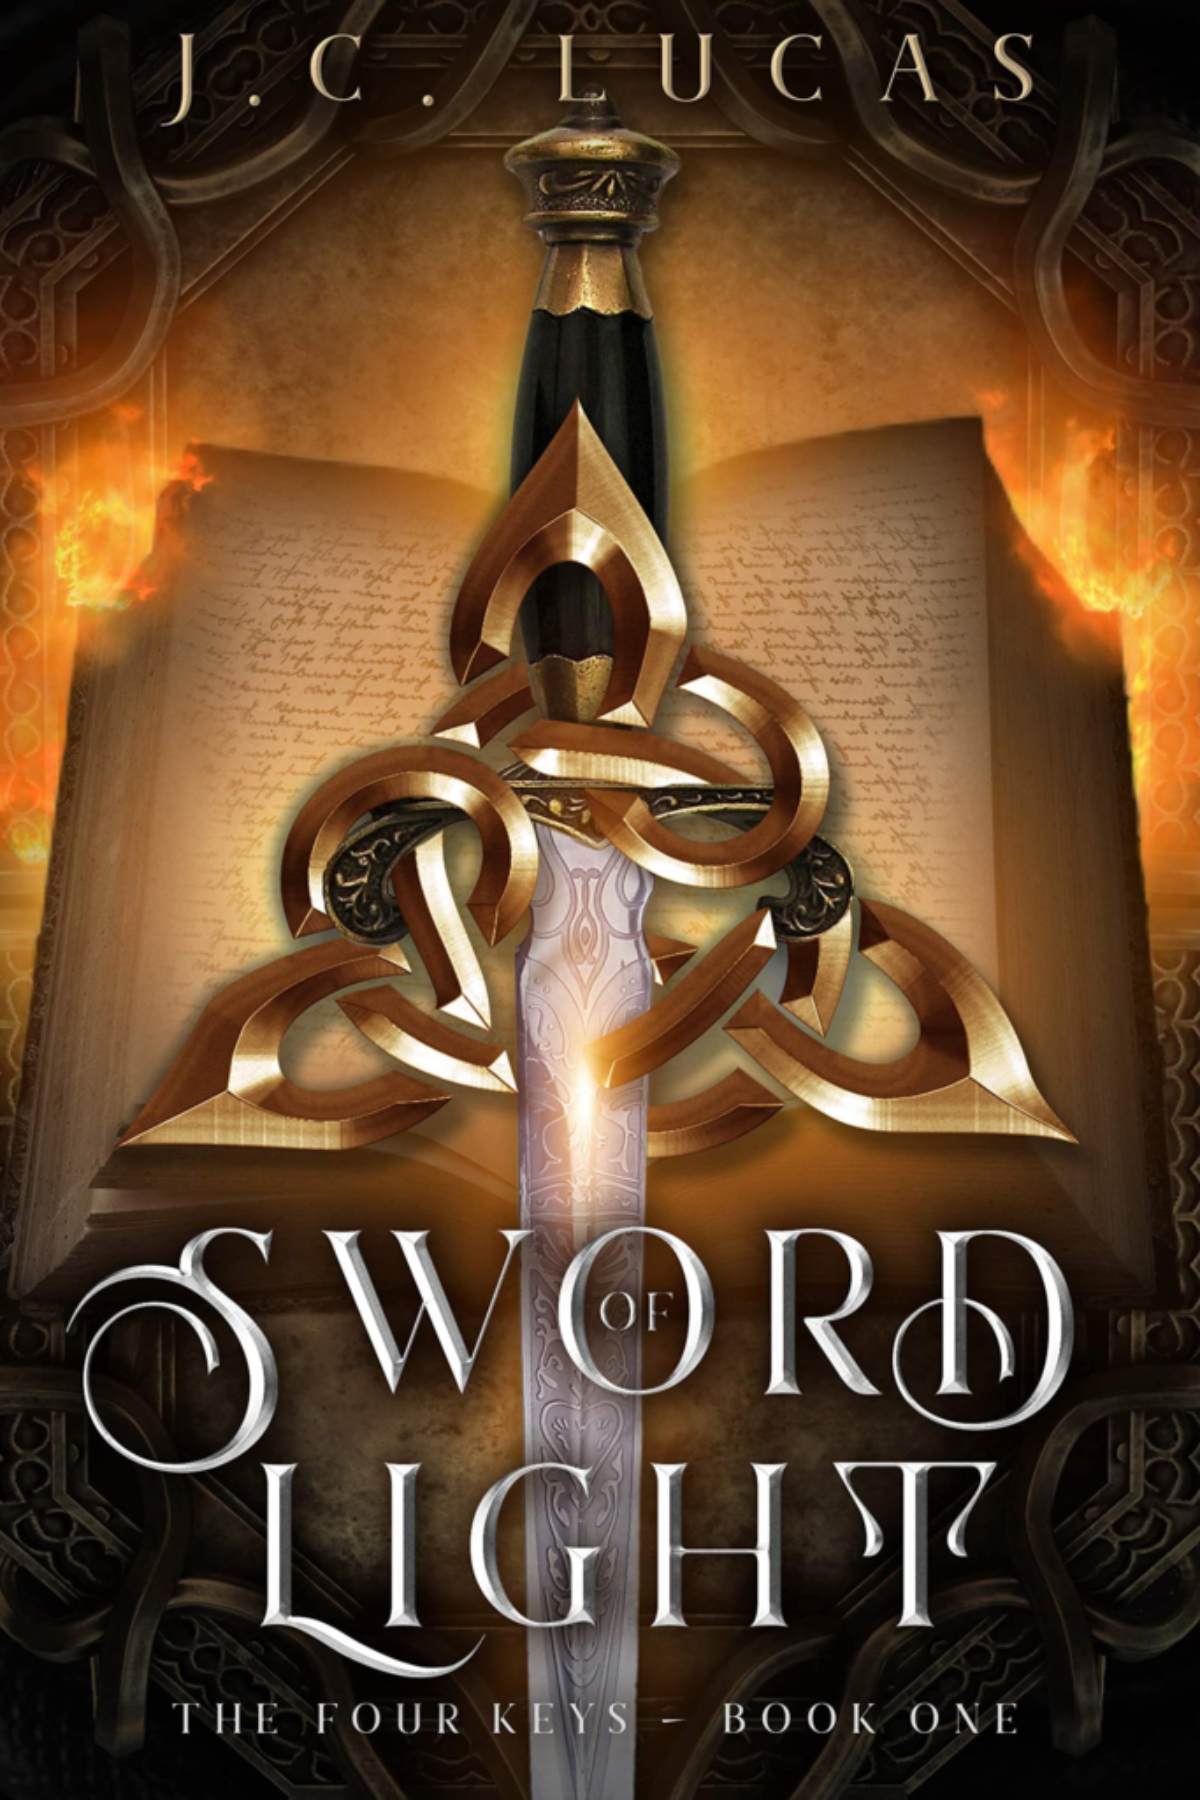 The Sword of Light